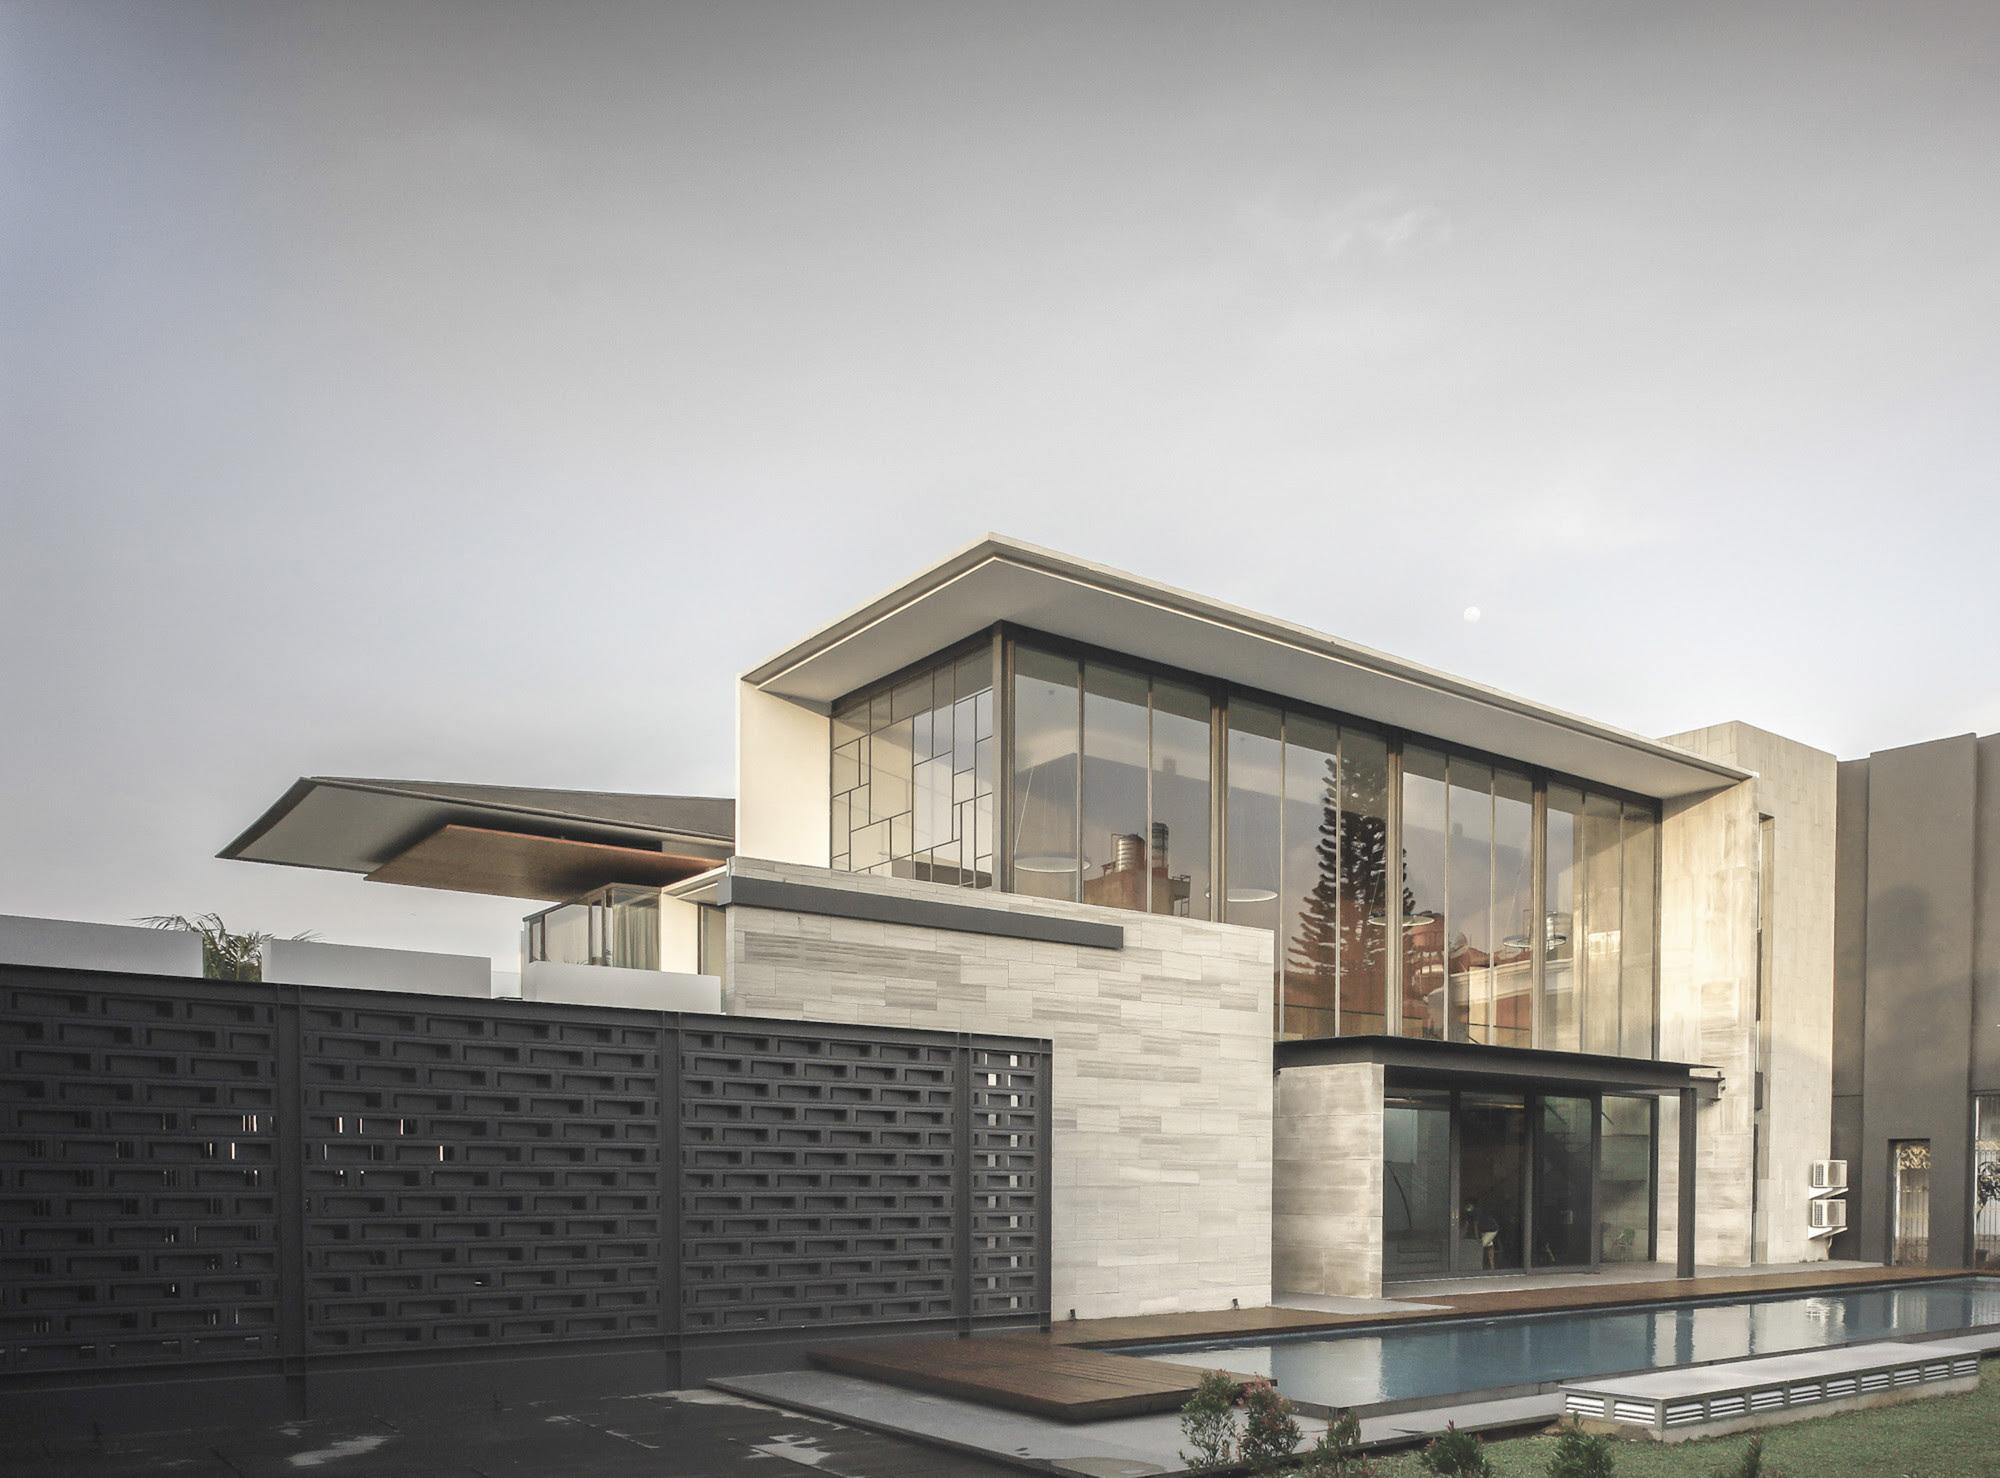 12 Desain Rumah Tropis Modern Didid Hapsoro Feed News Indonesia